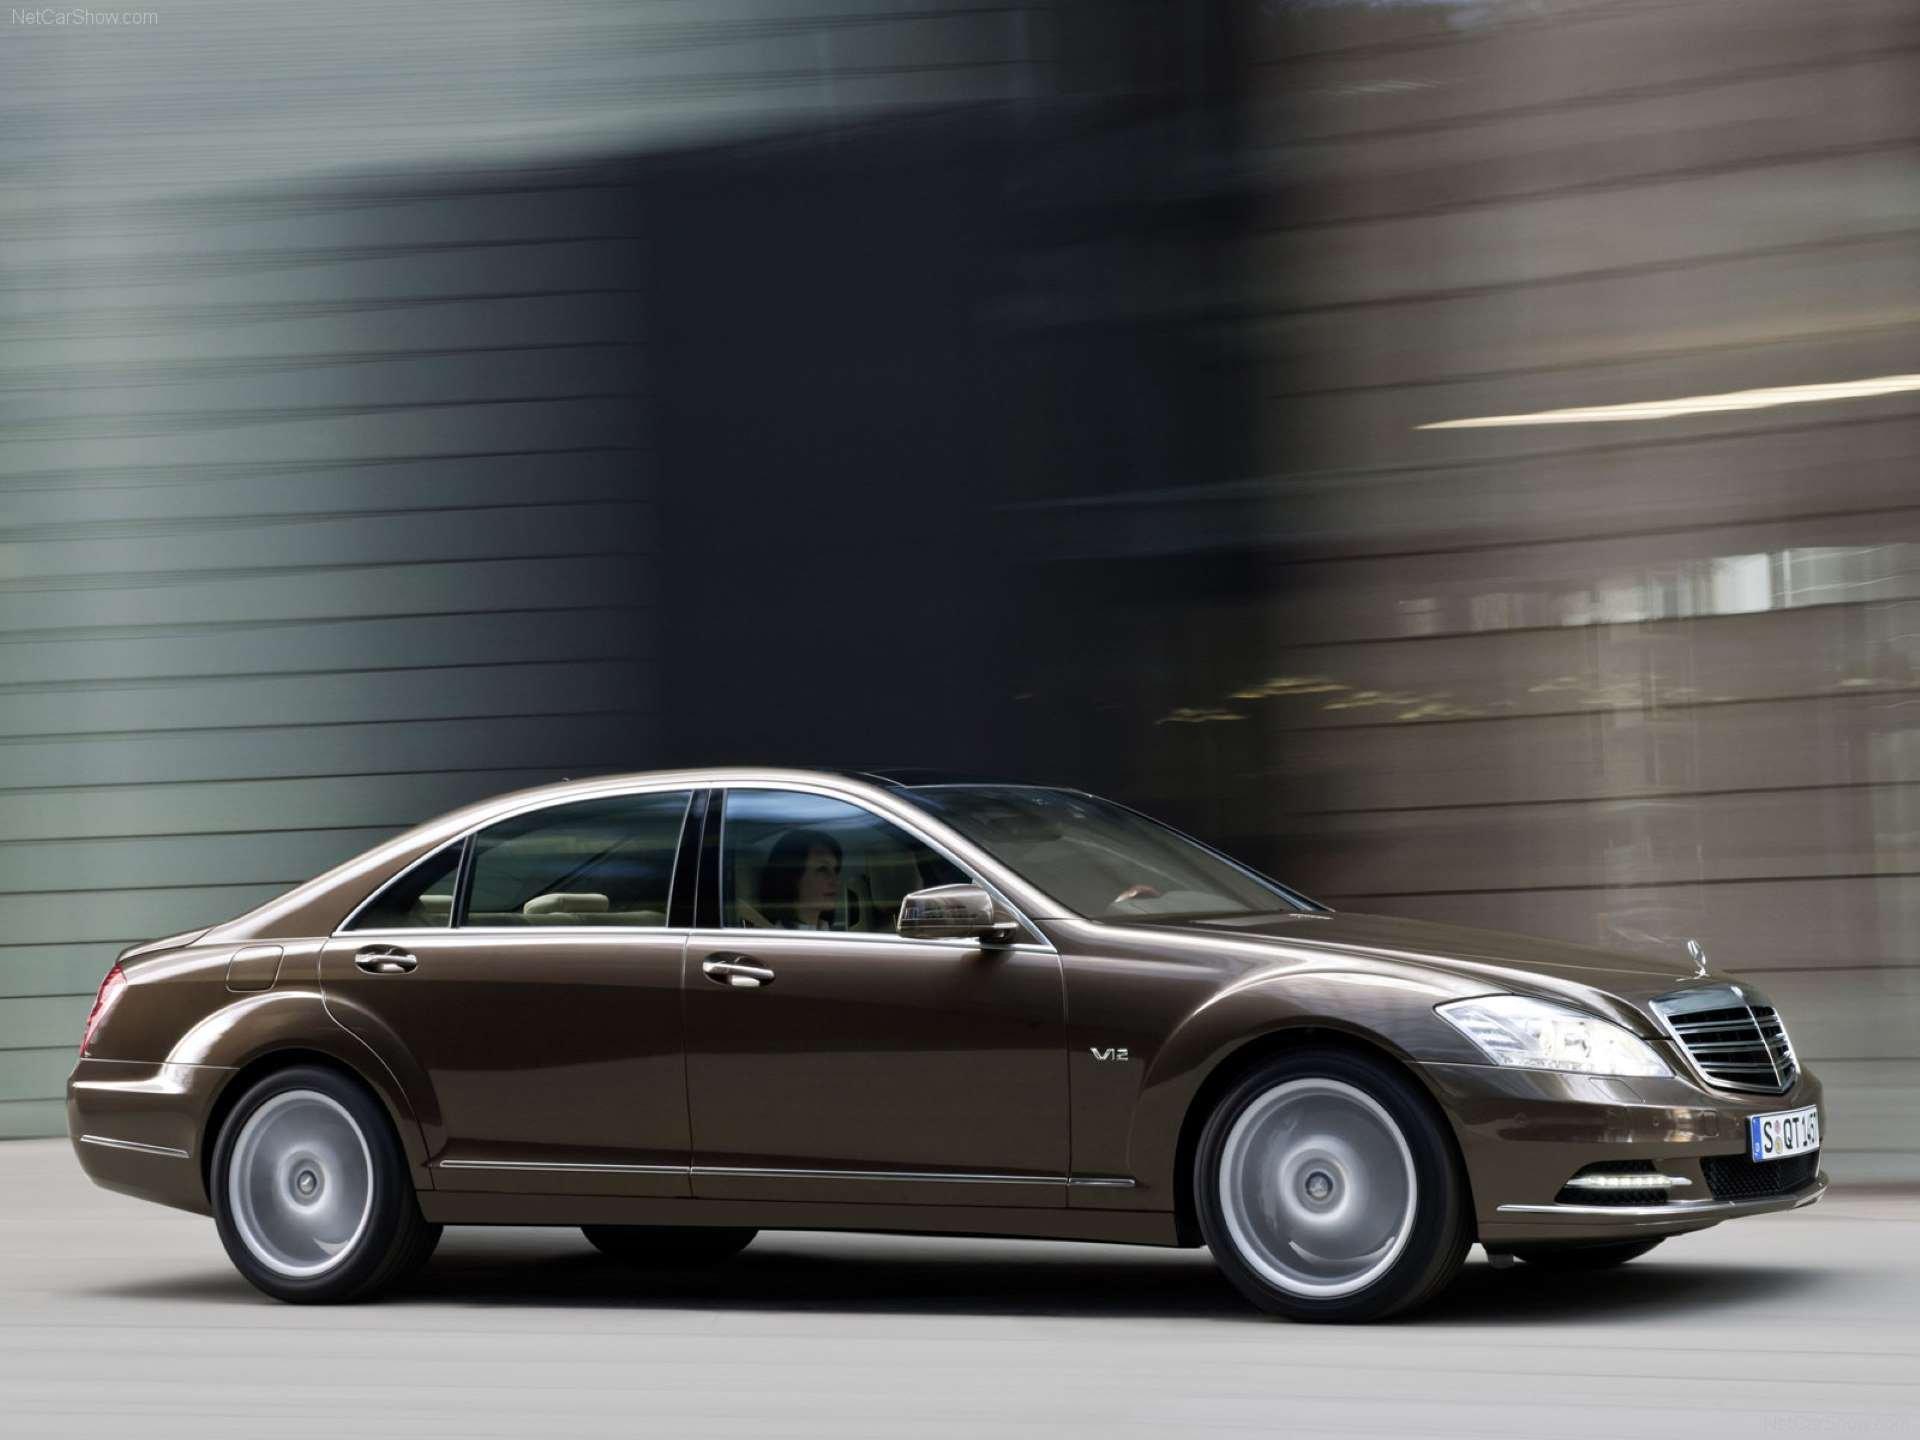 Best RWD Cars under 25K Mercedes-Benz W221 side